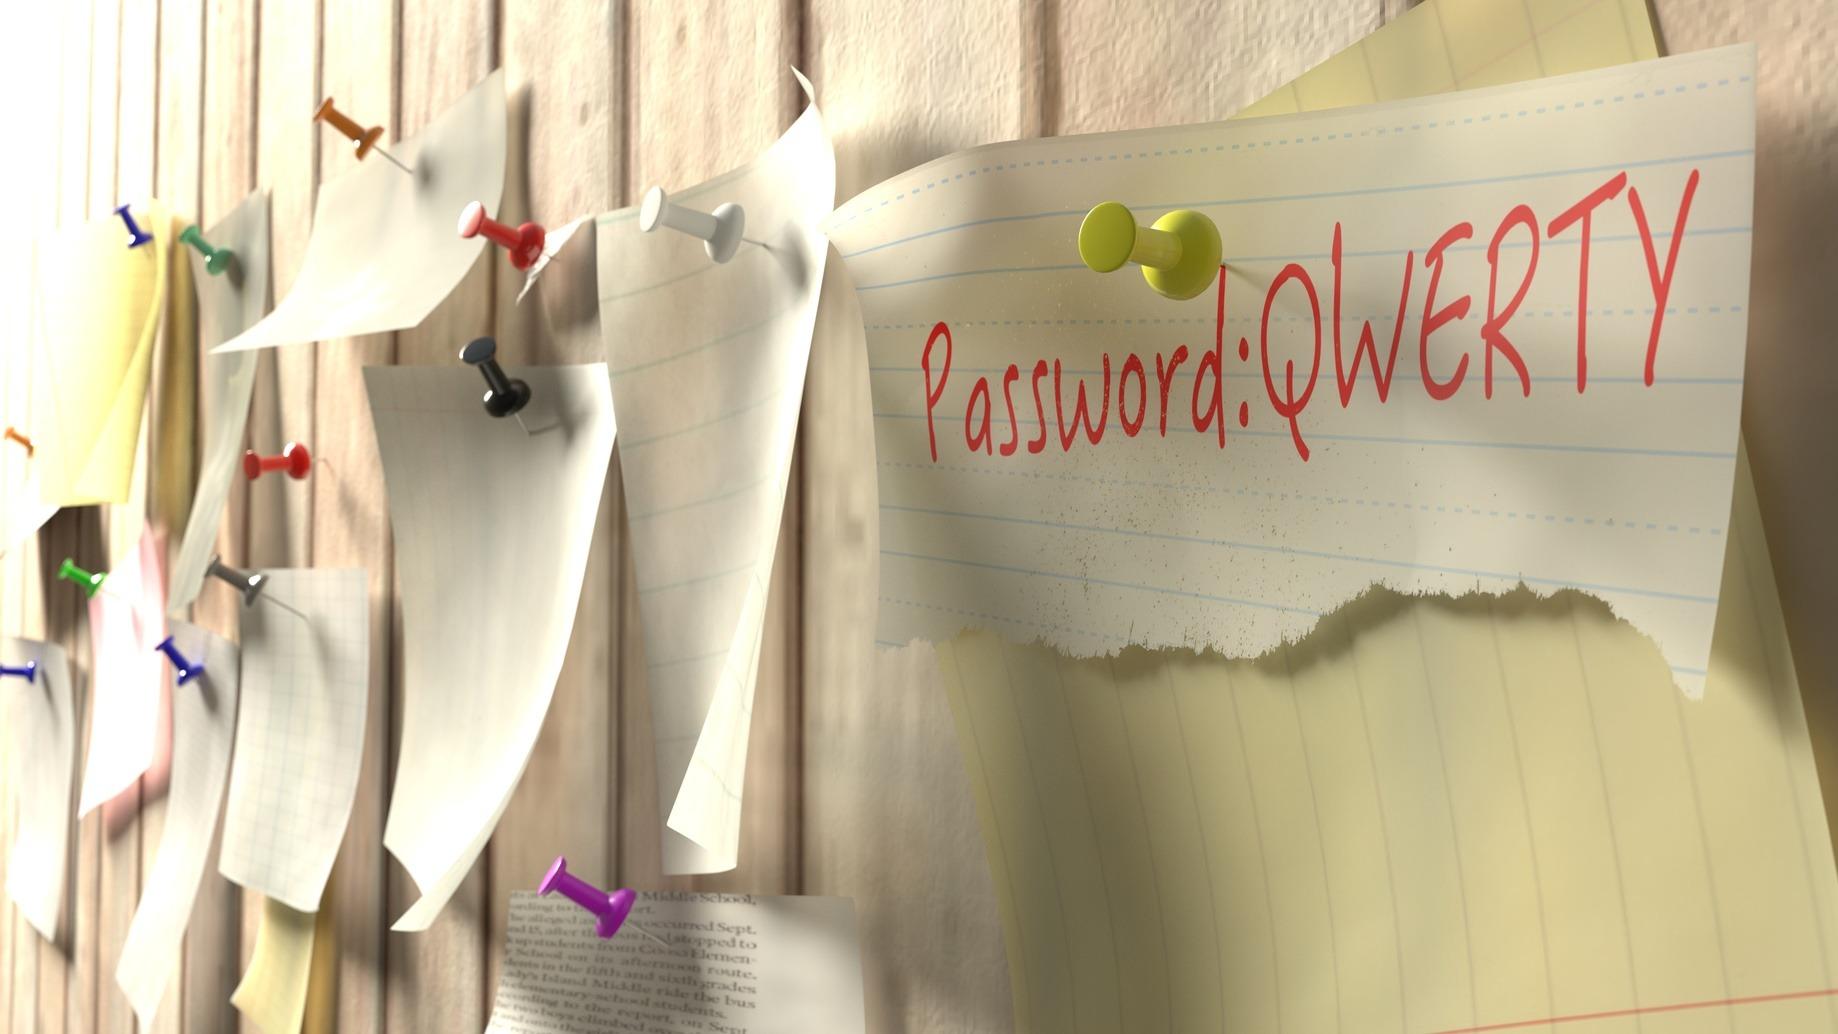 Password peggiori post-it